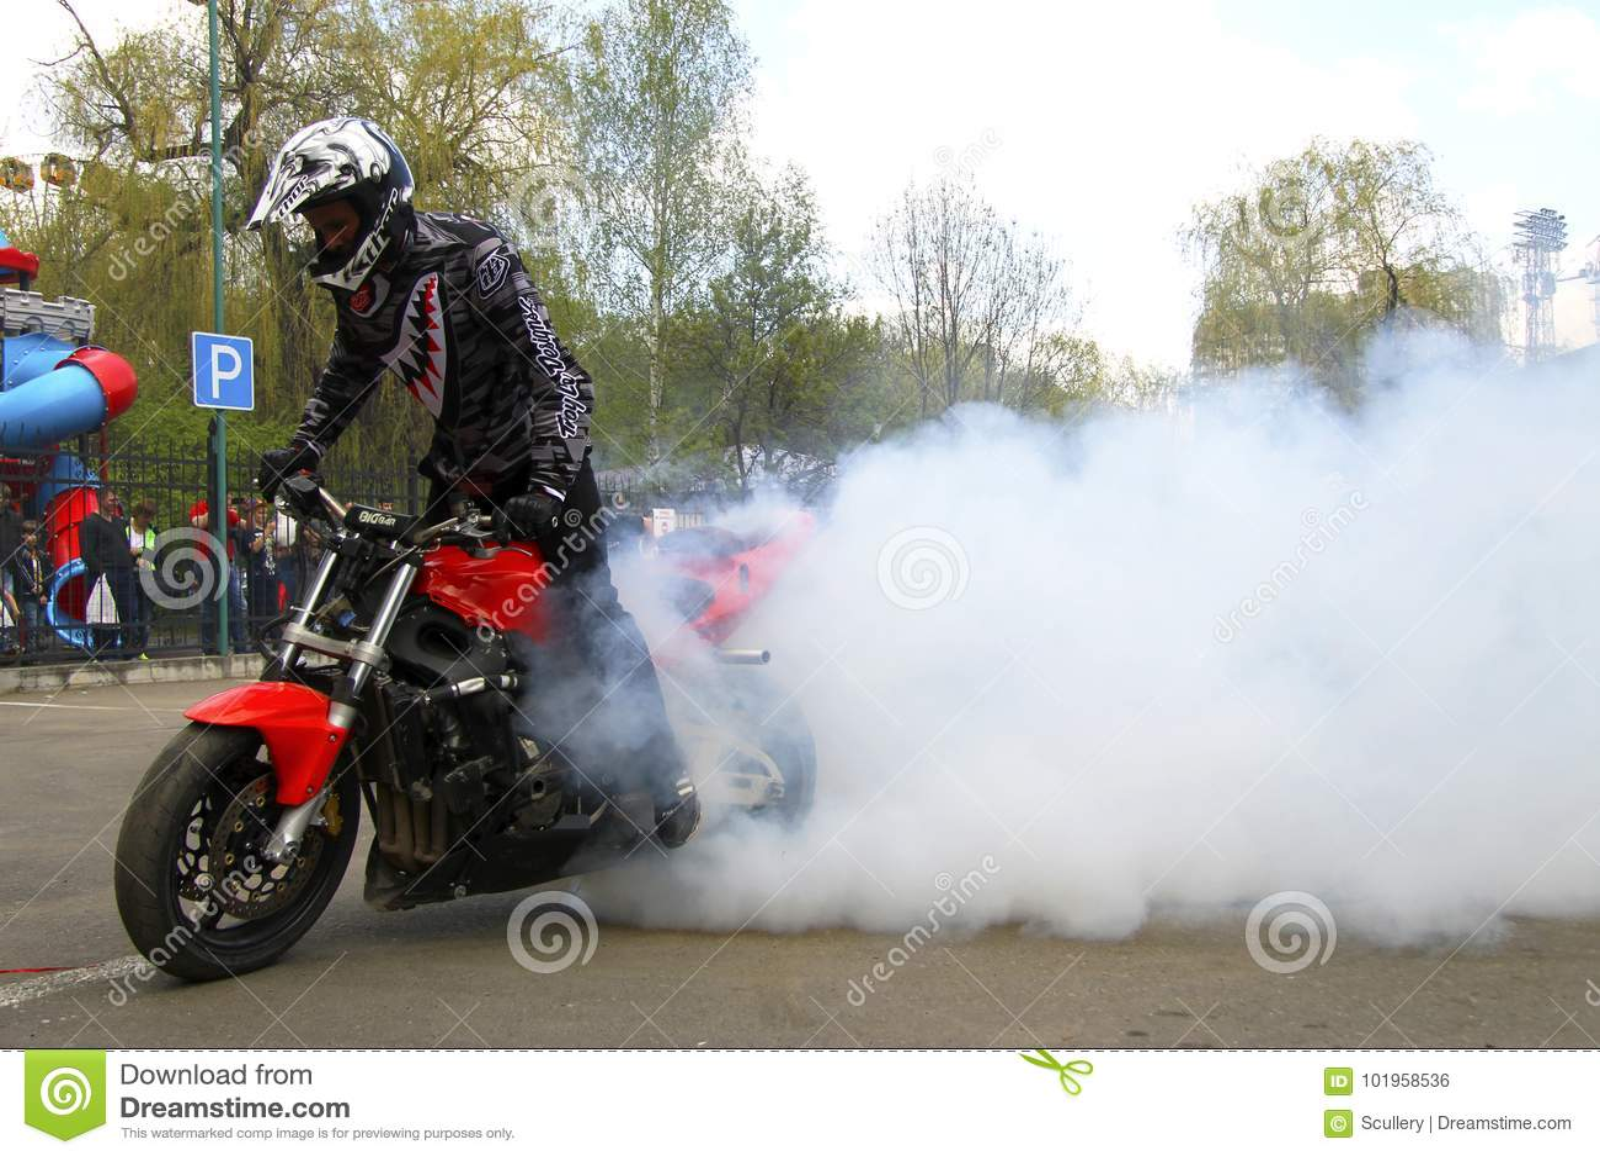 Motofree moto free style pilot stunting on the square editorial photo - image